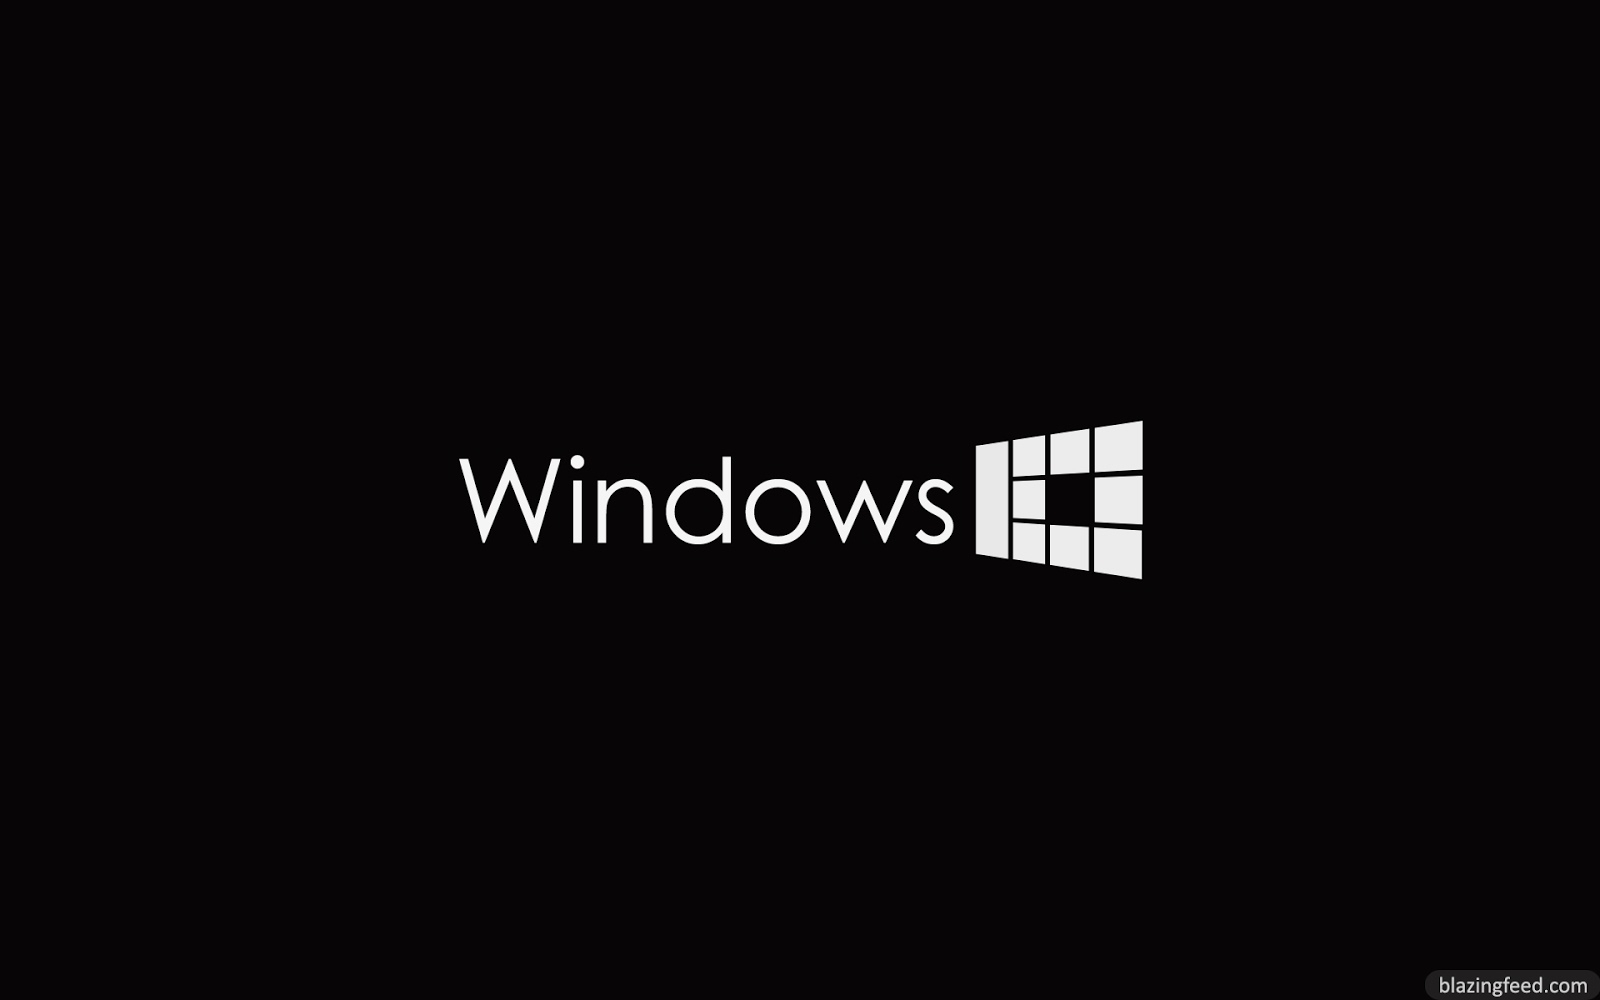 Wallpaper Layar Pecah 3d Download Wallpaper Windows 10 Keren Gratis